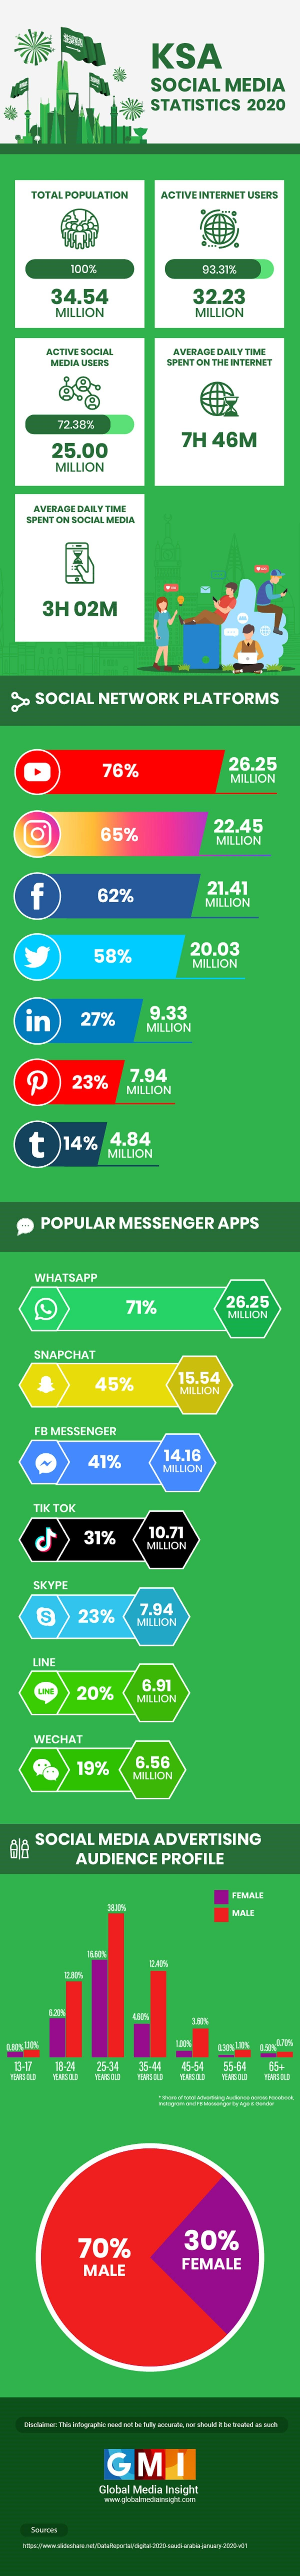 saudi-arabia-social-media-statistics-2020-infographic